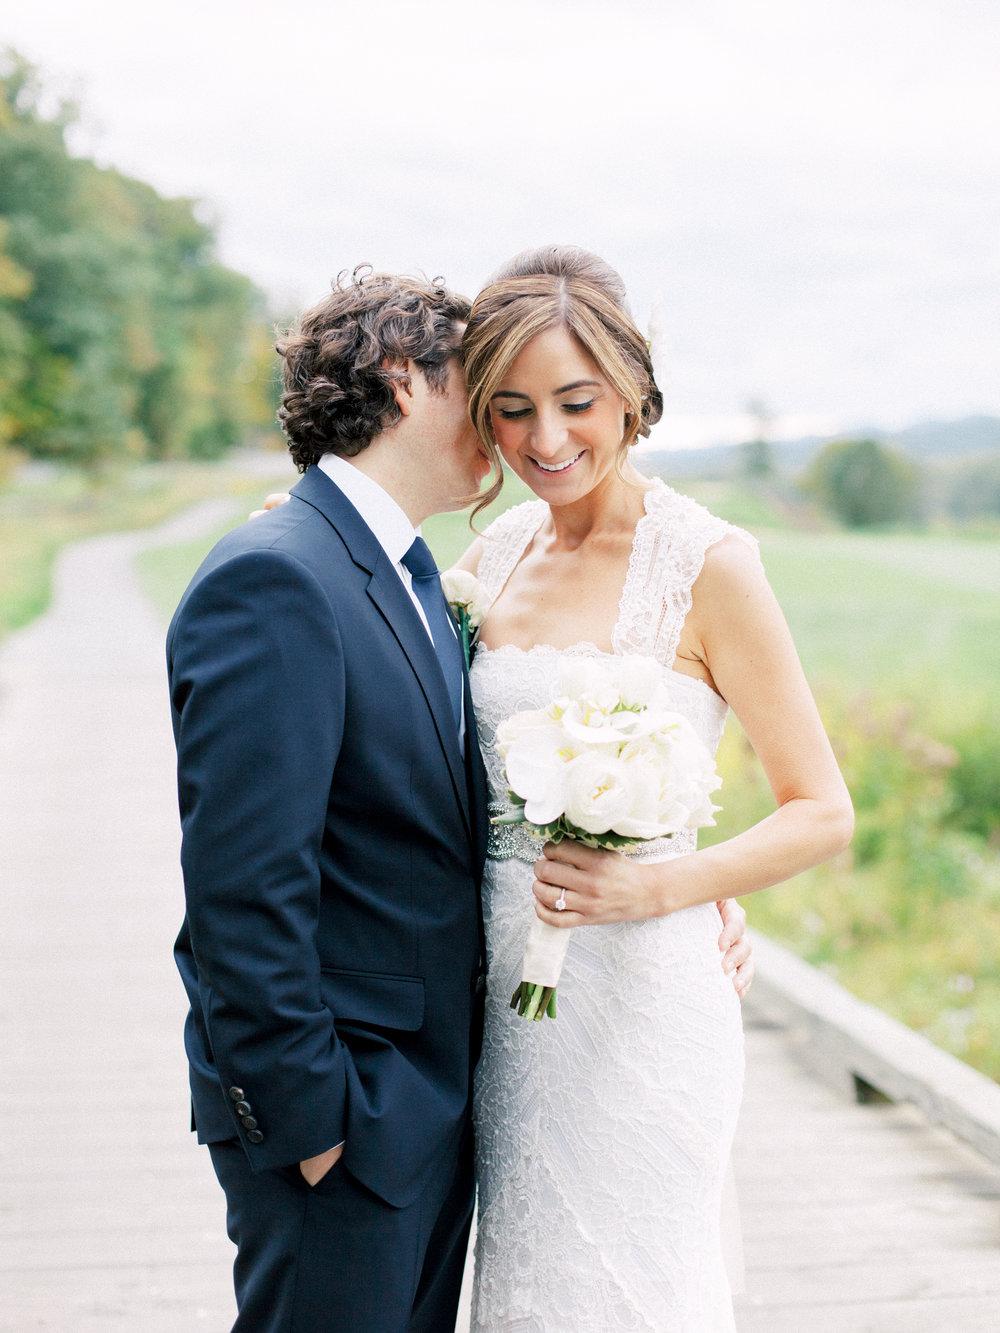 Omni William Penn Resort Wedding Pittsburgh Wedding Photographer Anna Laero Burgh Bride-22-2.jpg